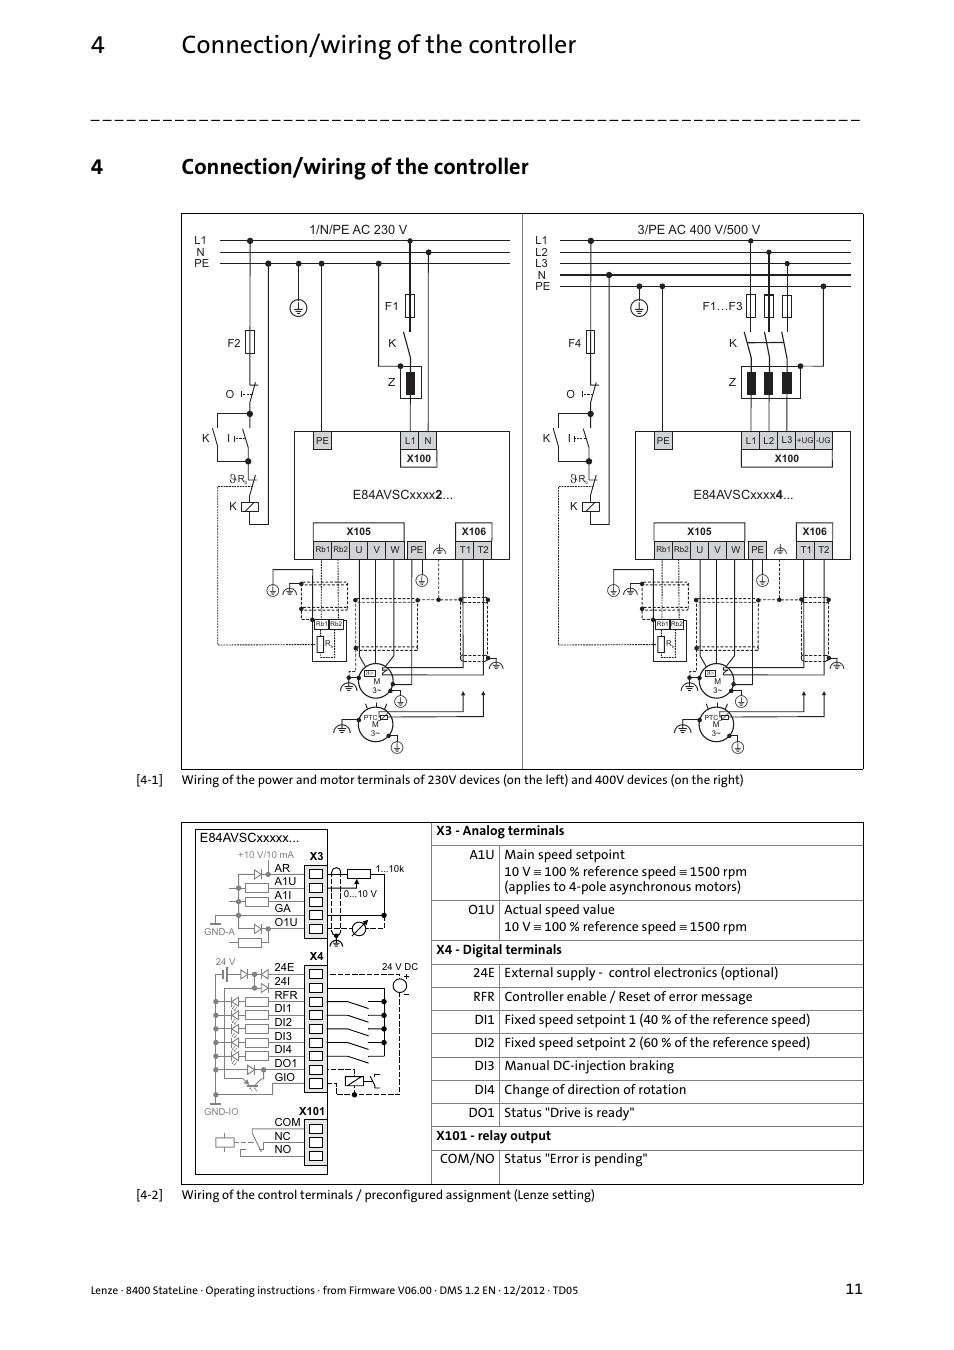 Lenze Wiring Diagram Auto Electrical Diagrams Friendship Bracelet